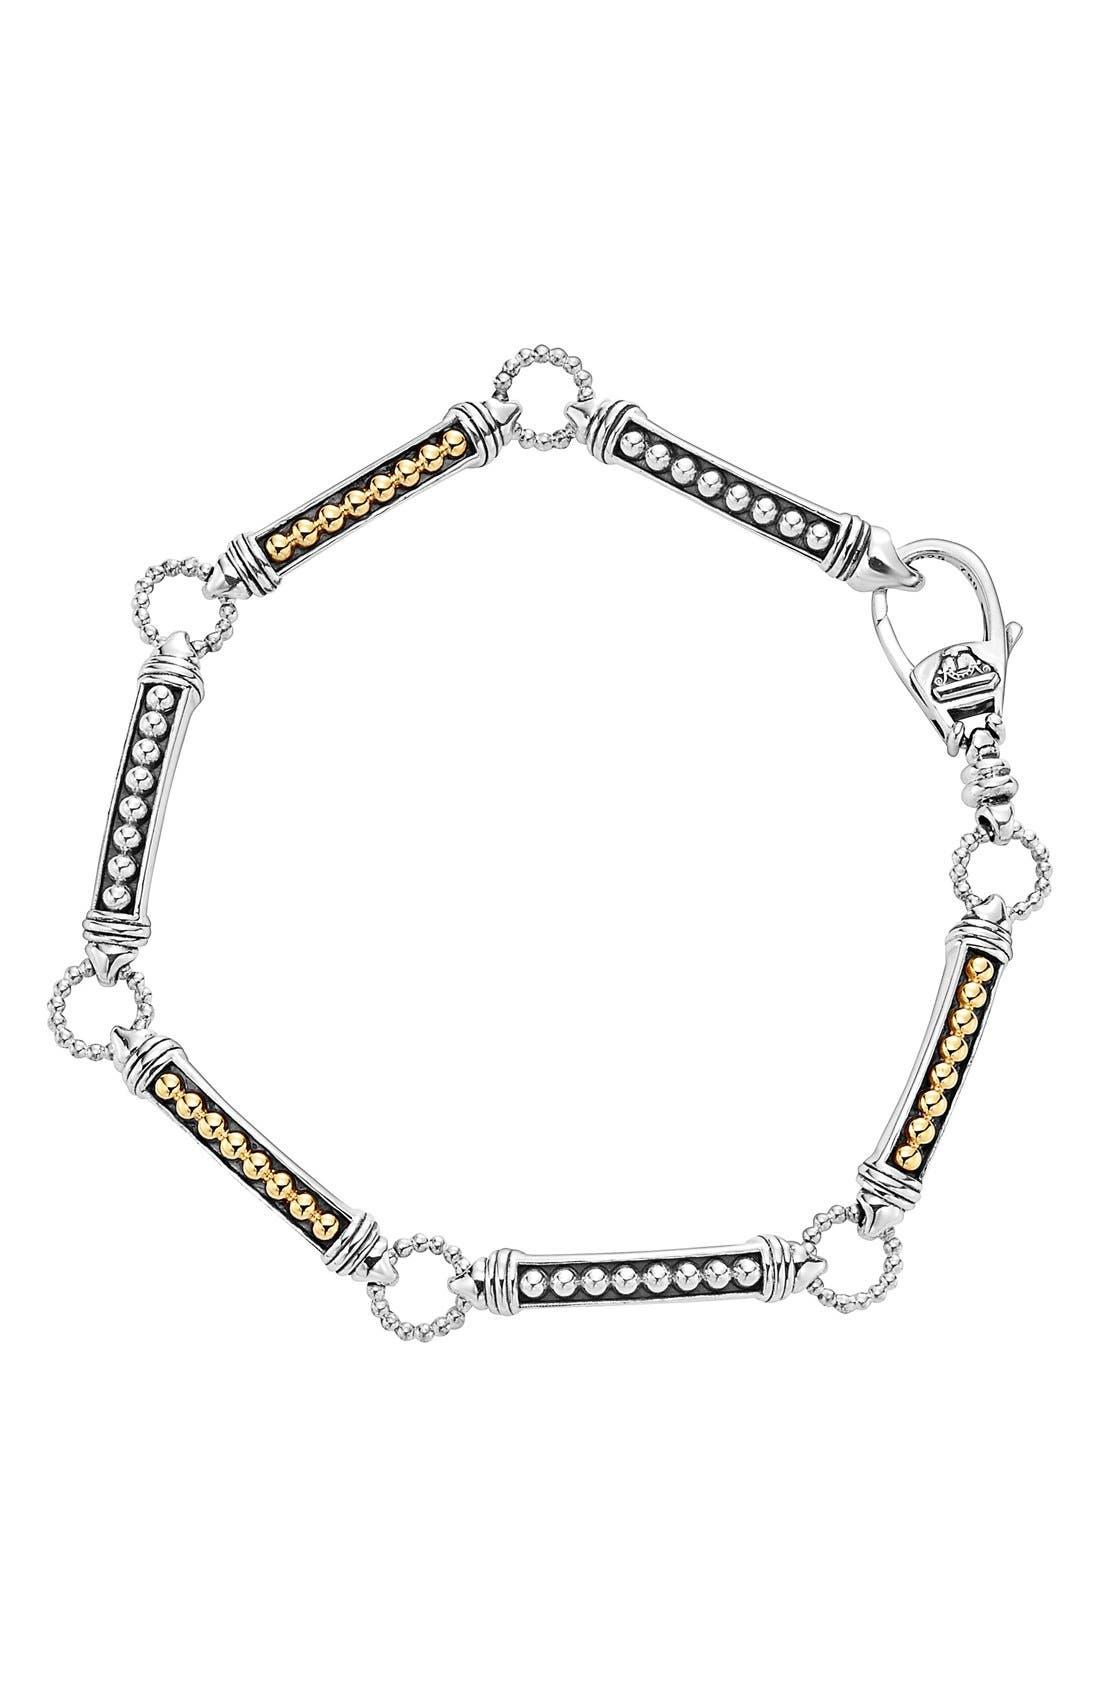 Alternate Image 1 Selected - LAGOS Caviar 'Superfine' Two-Tone Line Bracelet